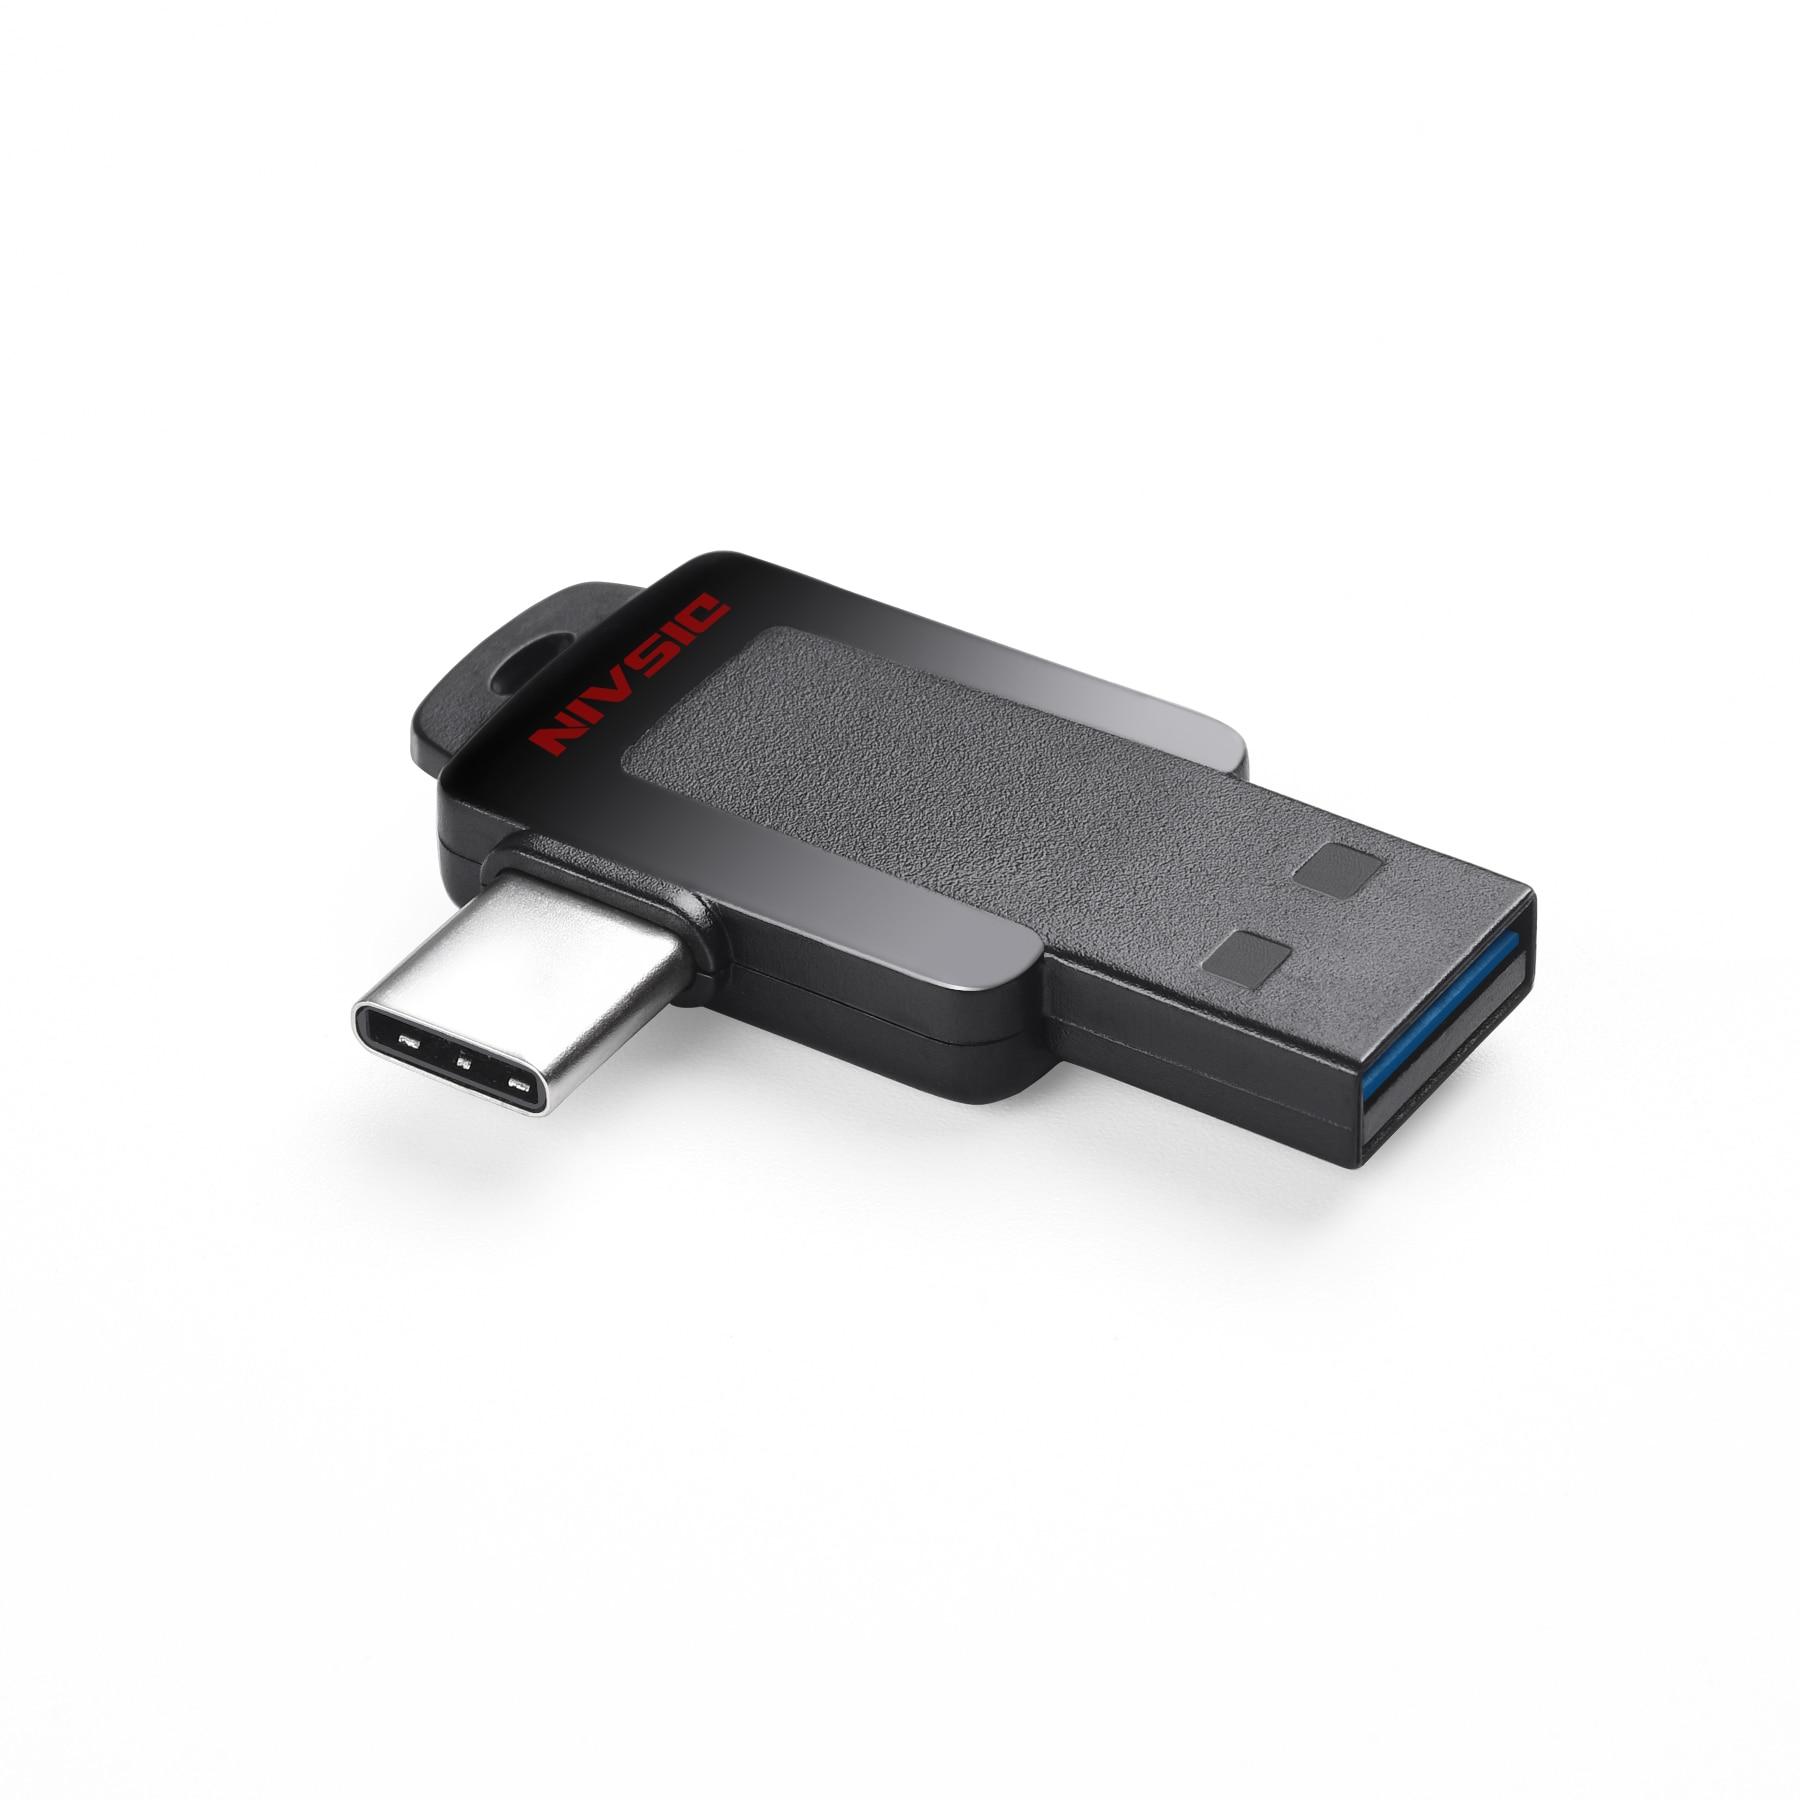 Mini  usb c flash drive  Dual flash disk  usb3.1Type C External Storage Memory Stick USB 3.0 Drive for Android, Pc, Smartp